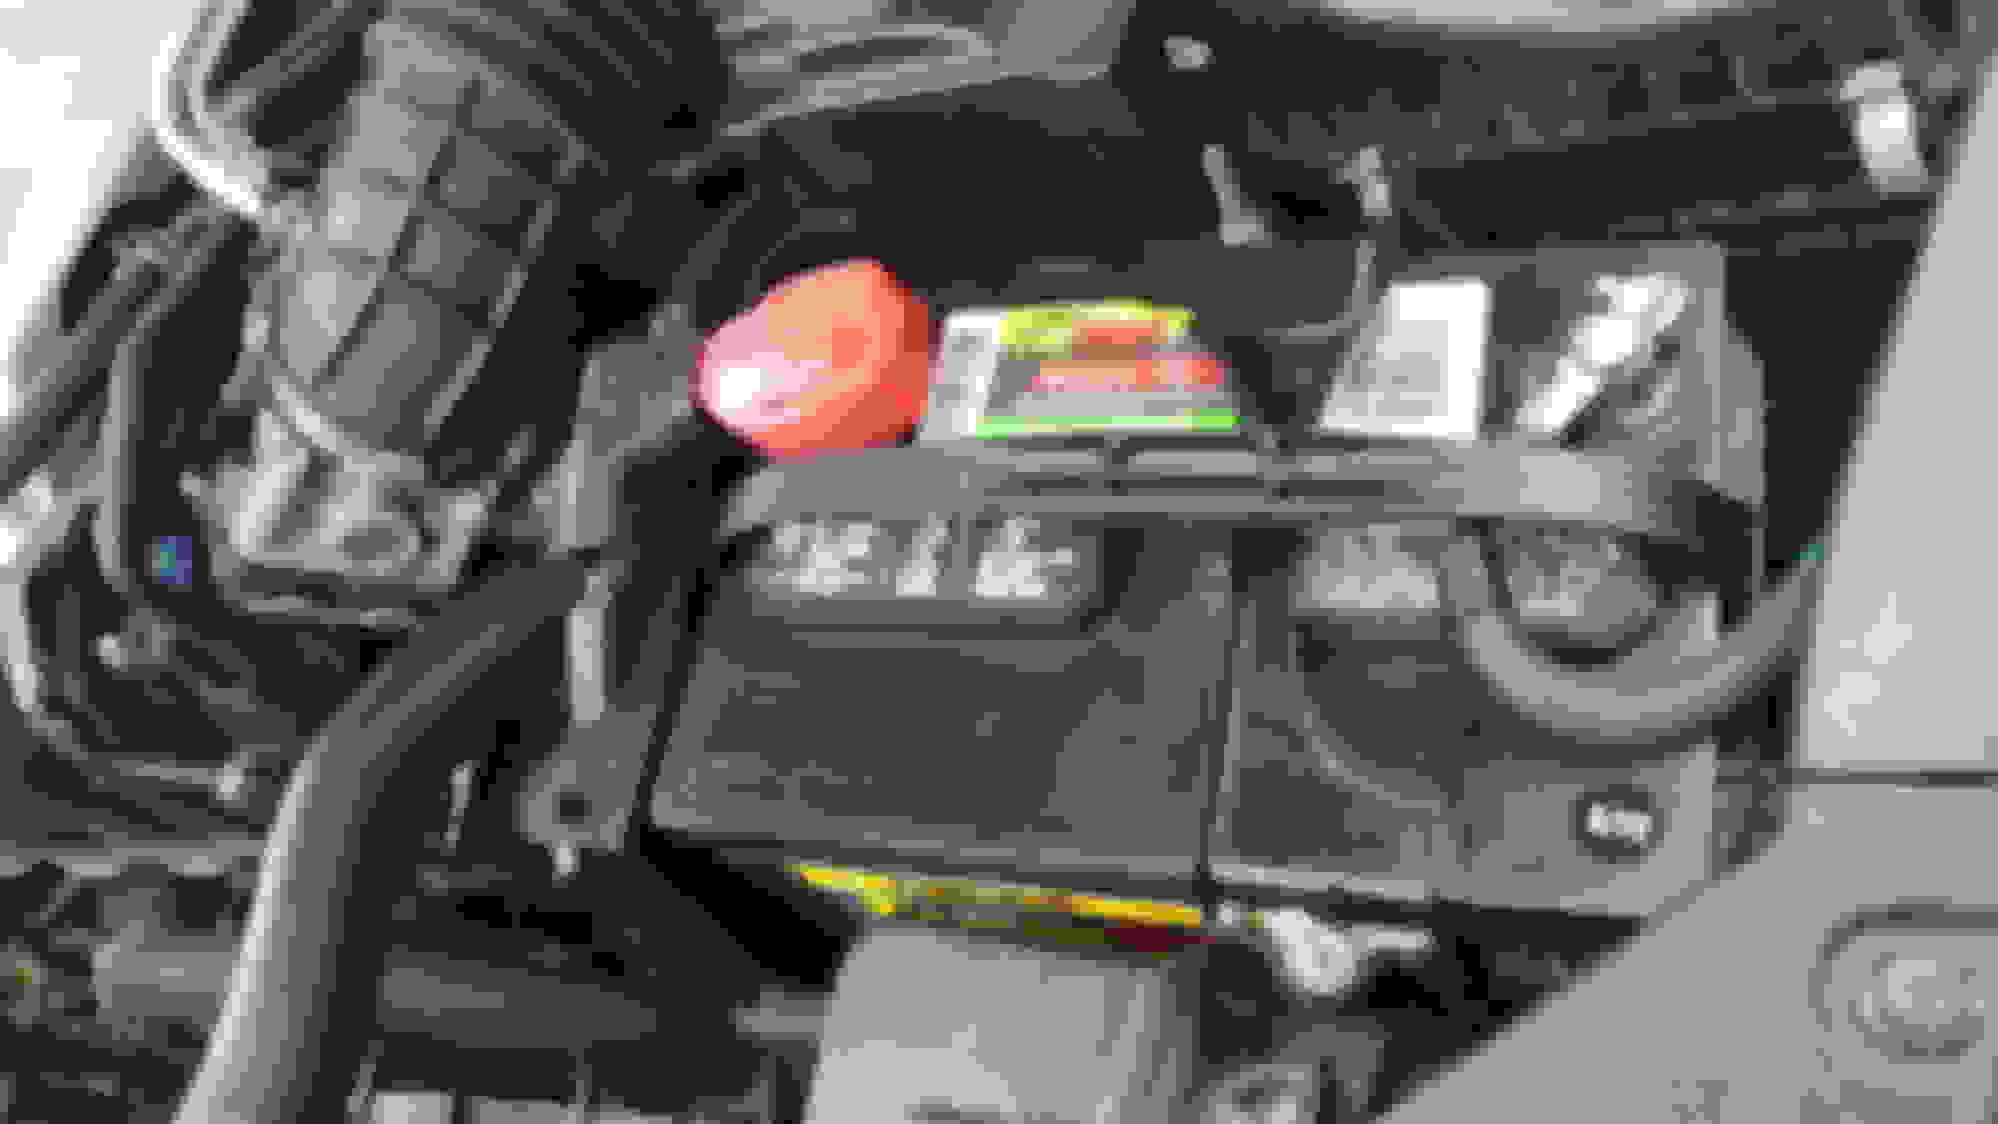 Upgrade to V6 battery - AcuraZine - Acura Enthusiast Community